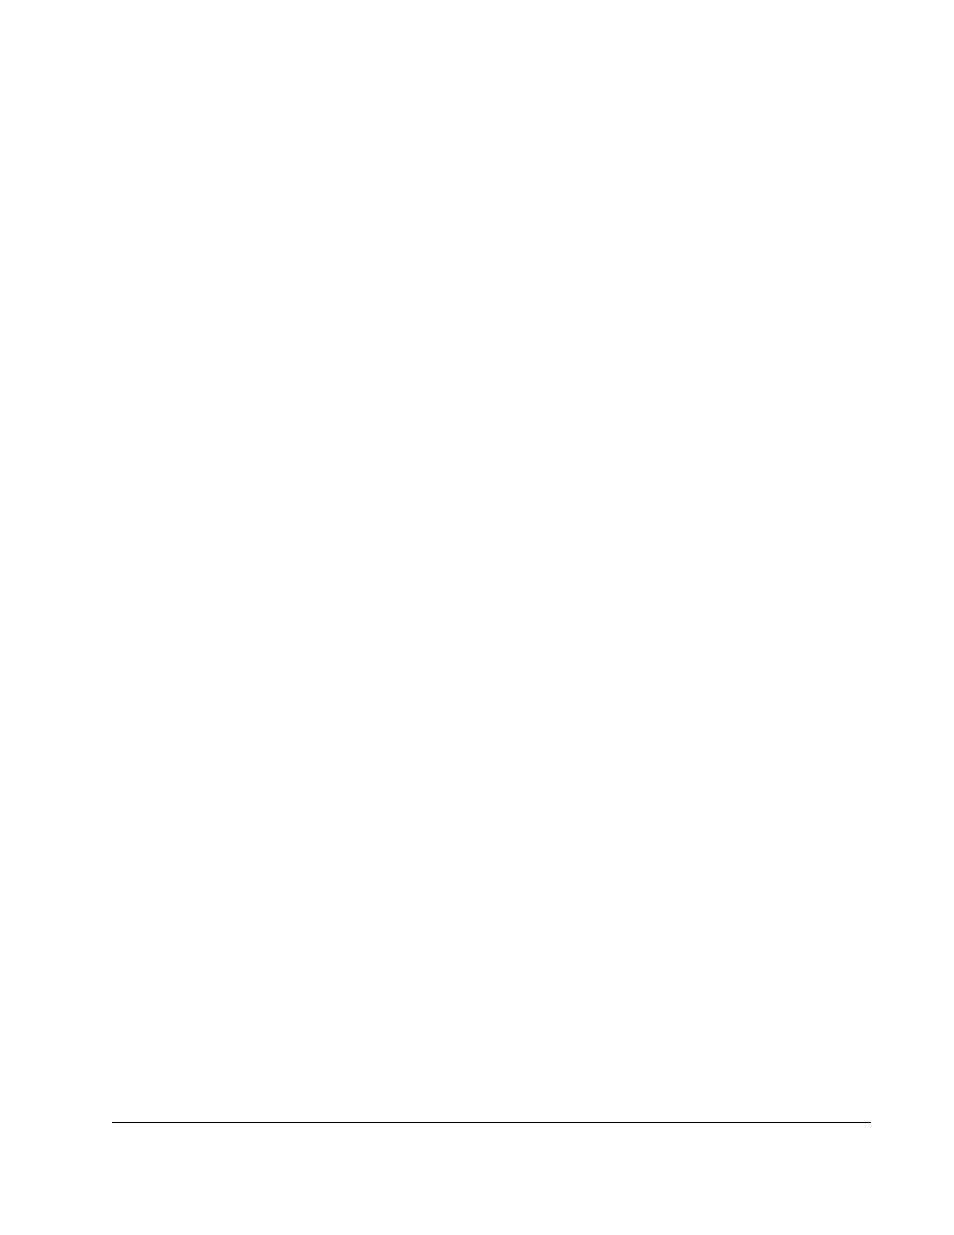 Rockwell Automation FlexPak 3000 Drive Field Current Regulator Kit